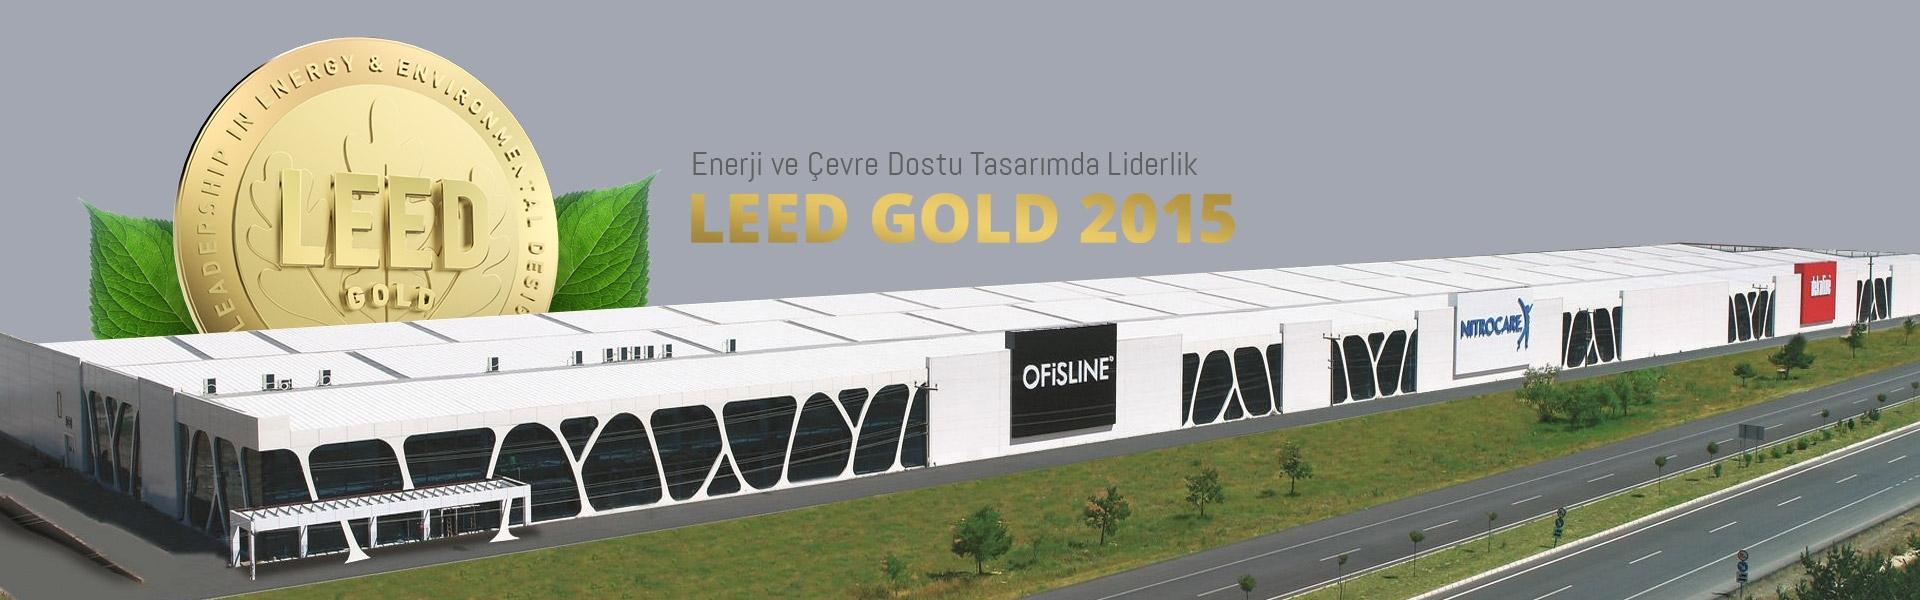 LEED GOLD 2015